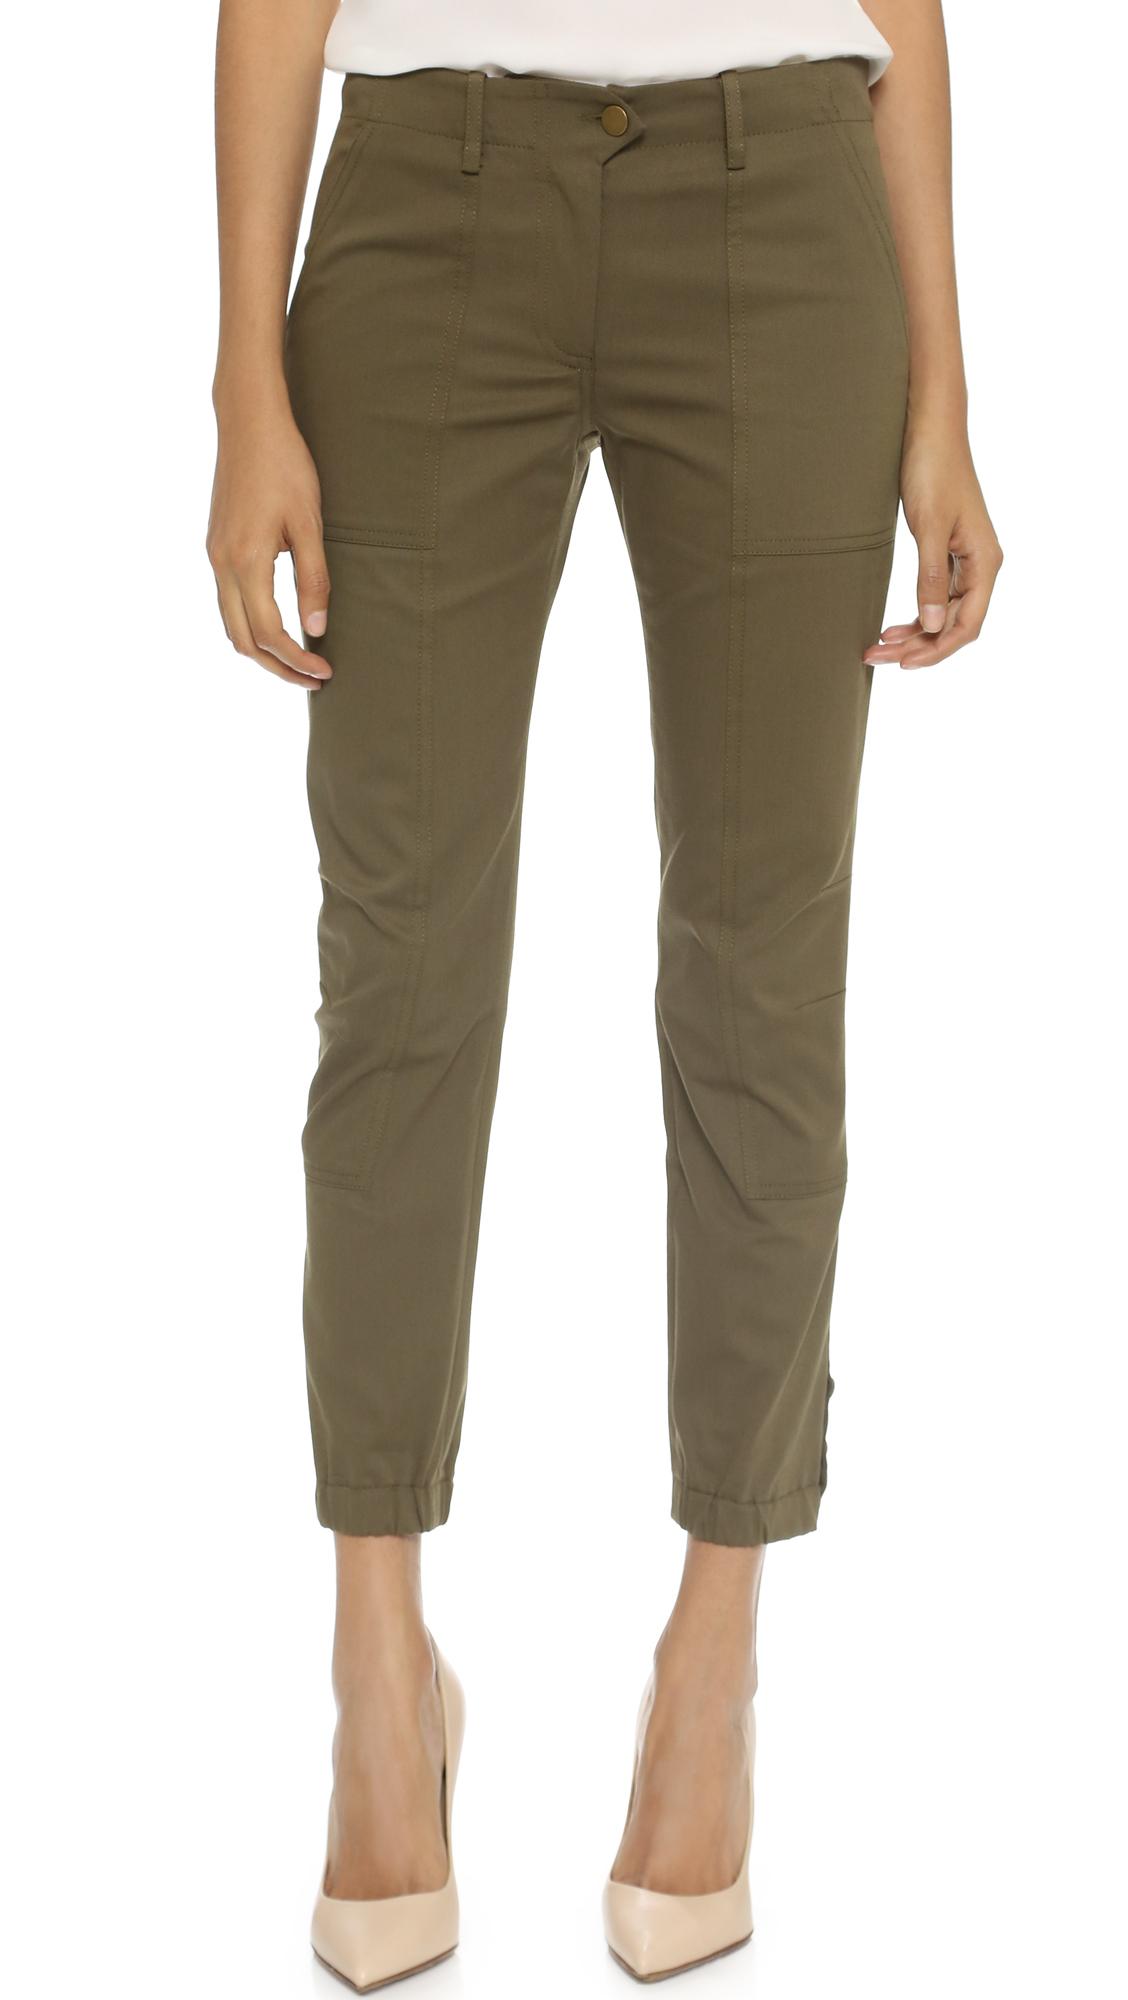 Amazing  Green Cargo Pants Leisure Army Fashion Women Army Green Pants